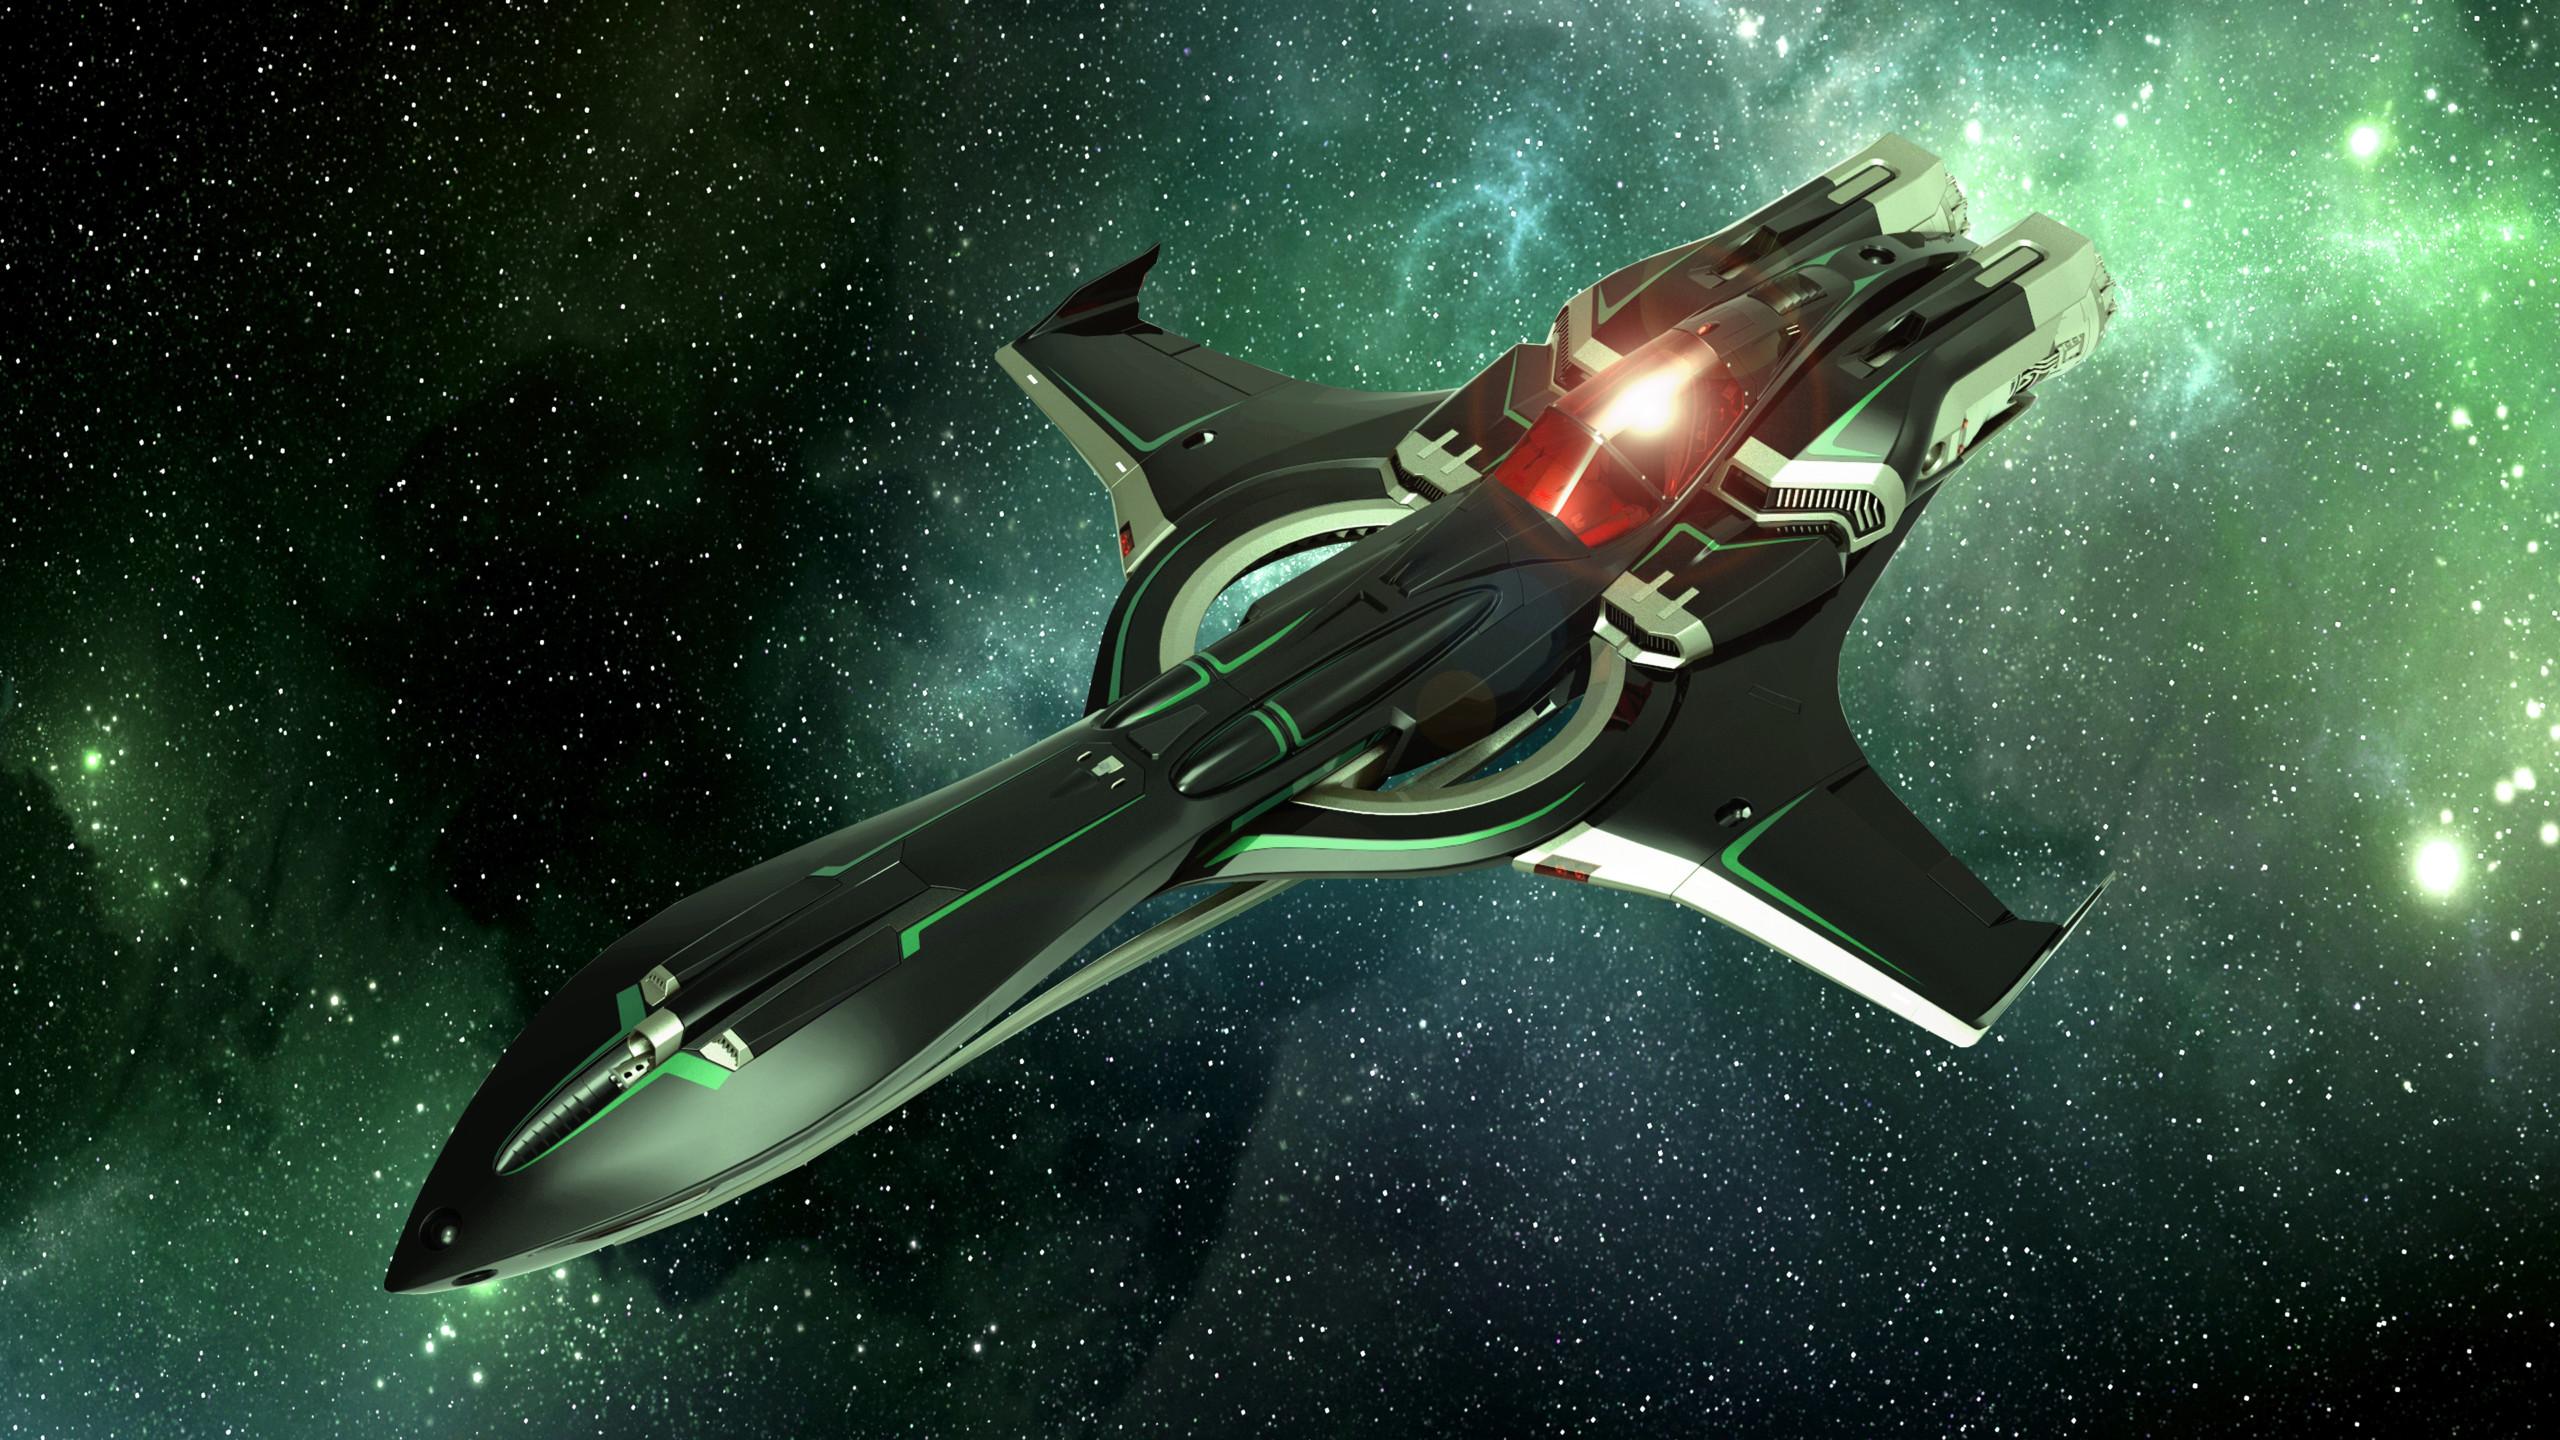 P72 Archimedes Emerald